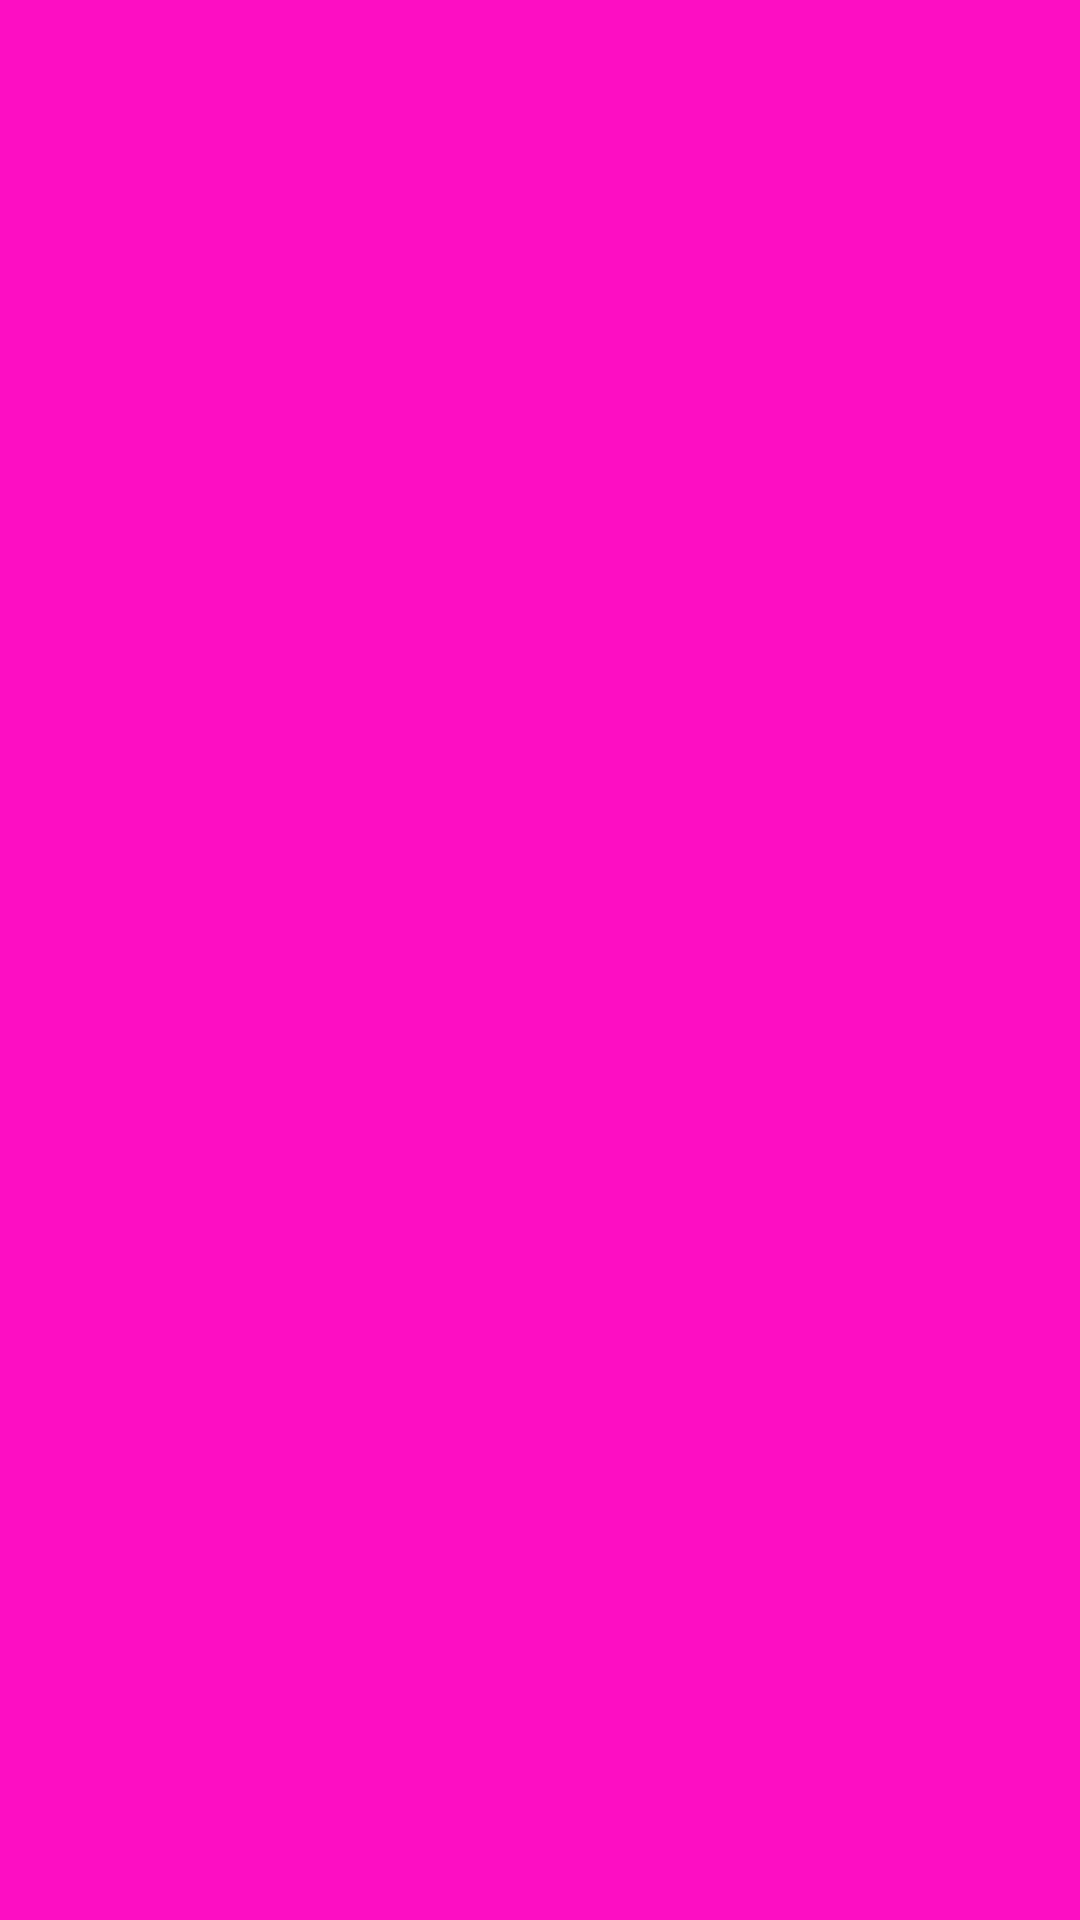 1080x1920 Shocking Pink Solid Color Background